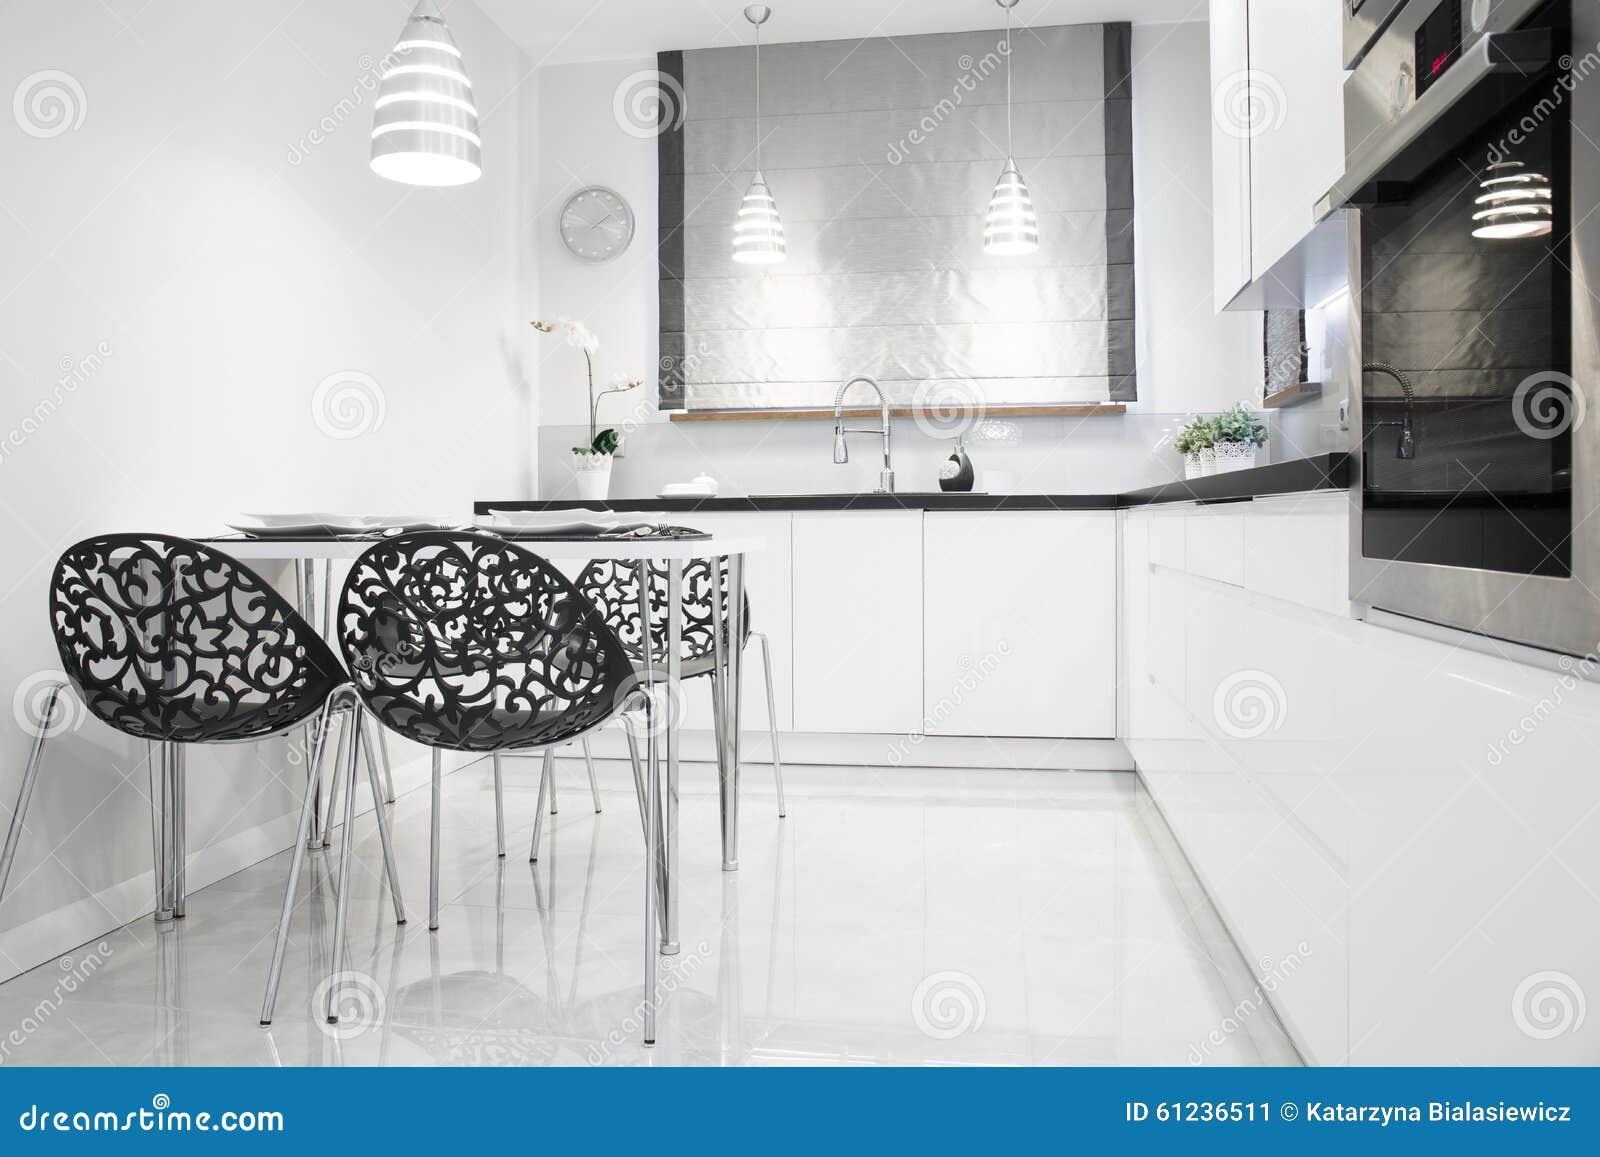 Cucina bianca e nera immagine stock. Immagine di appartamento ...